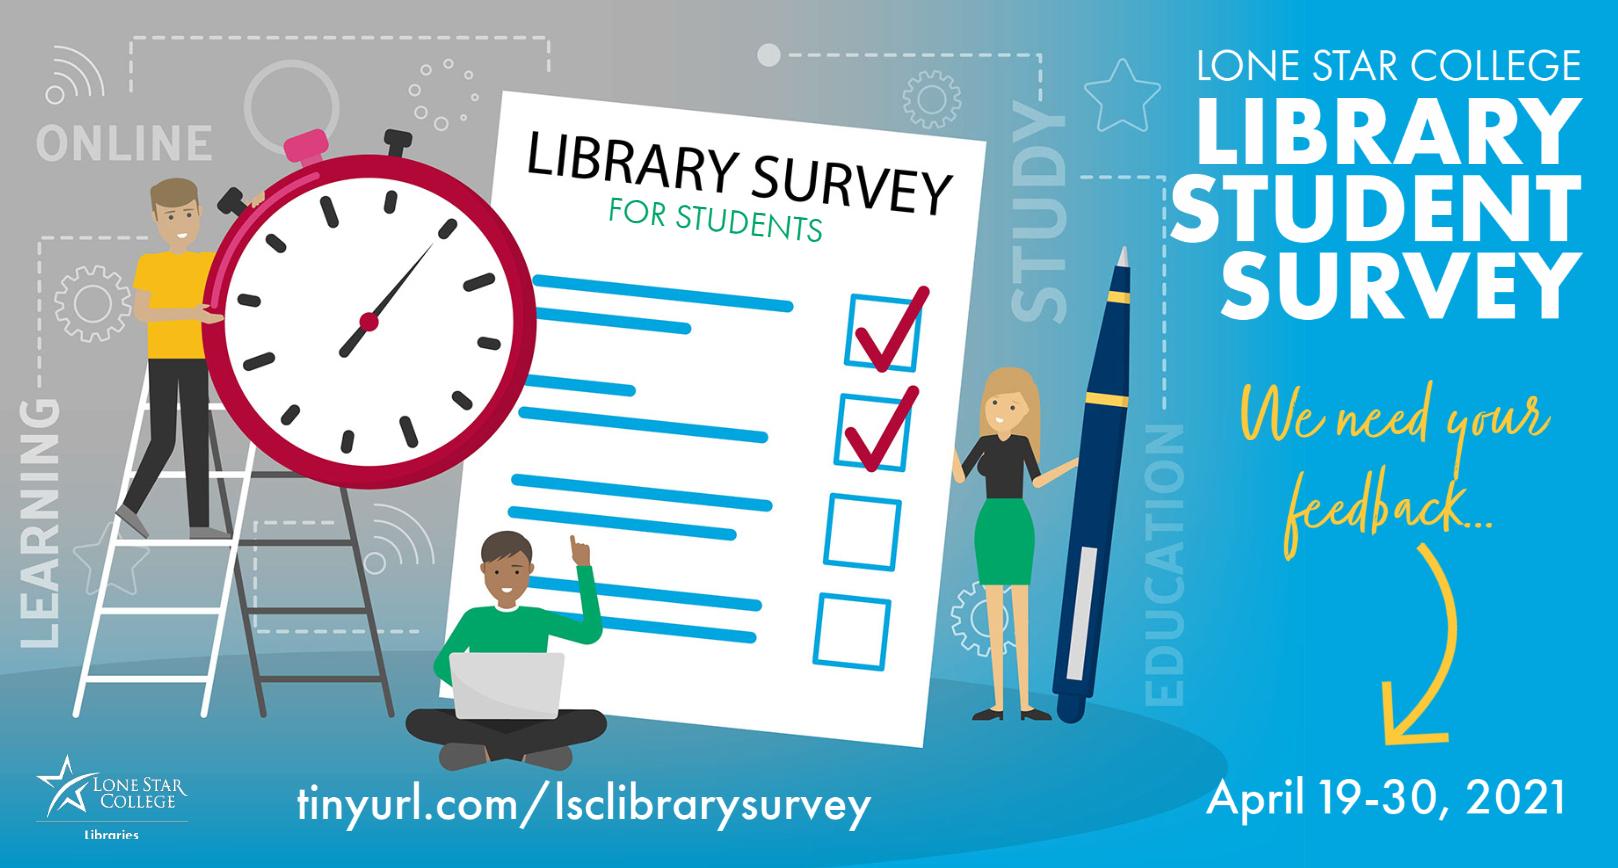 Library Survey April 19-30, 2021